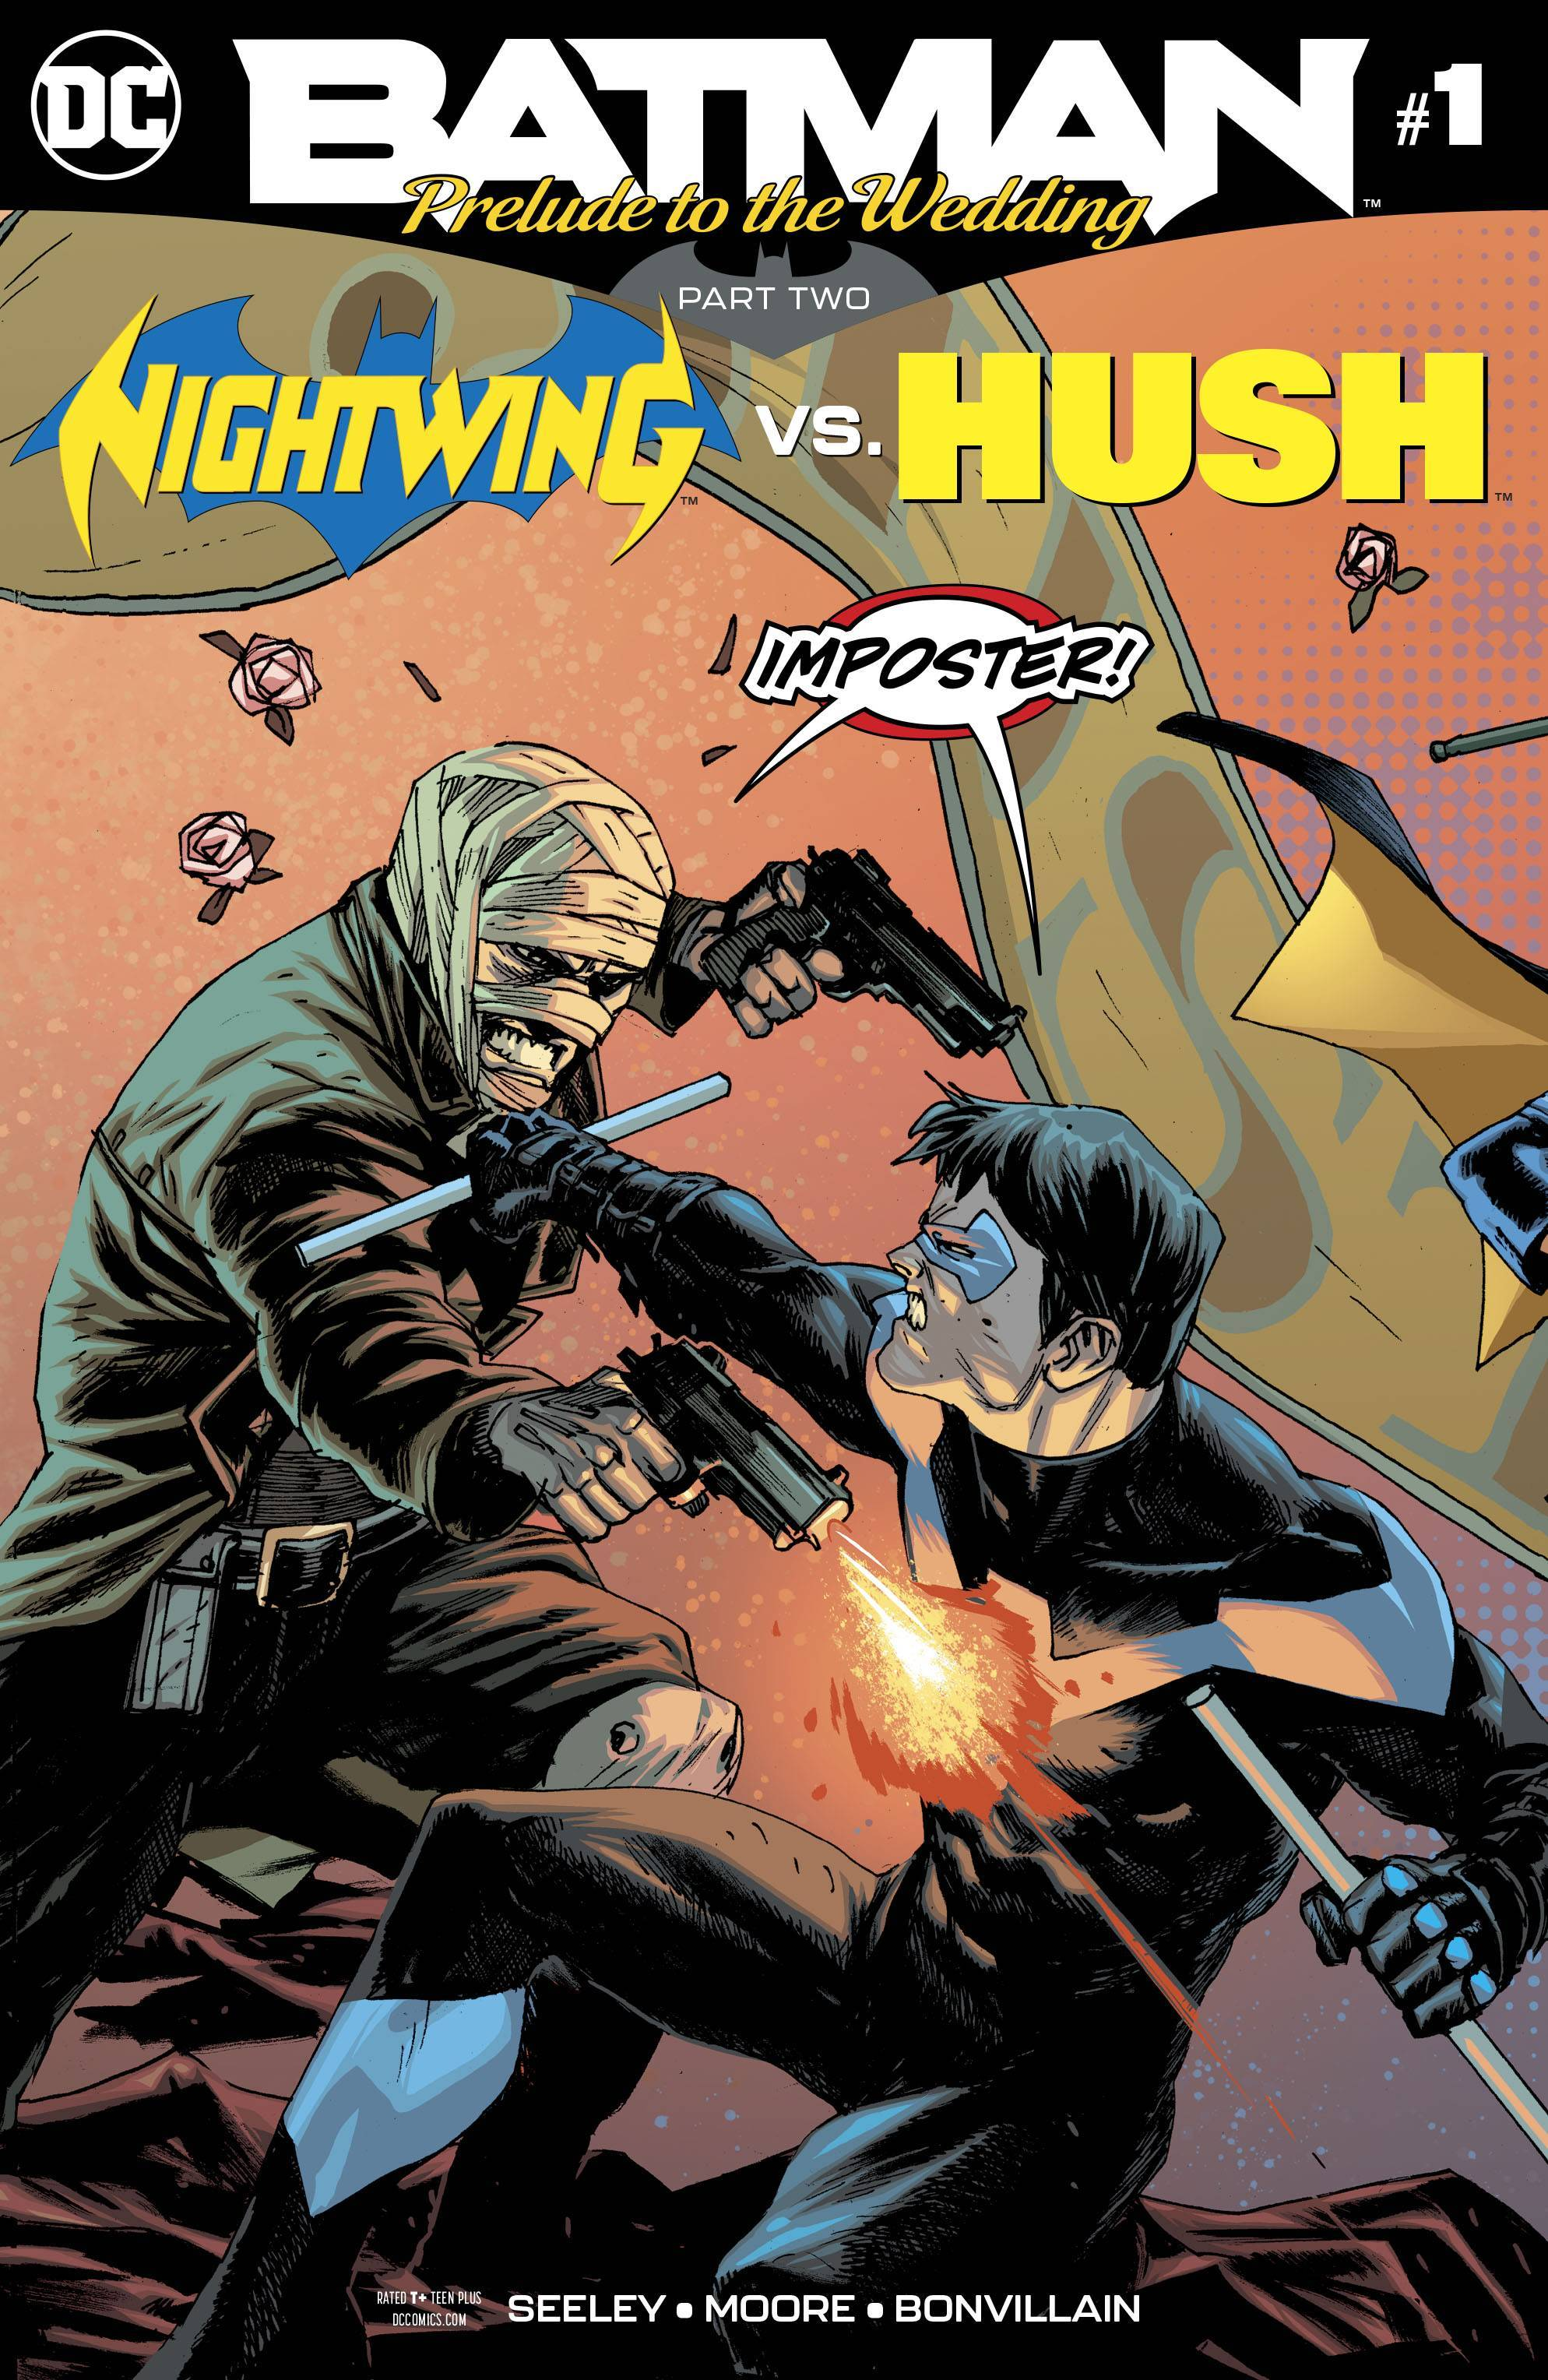 Prelude To The Wedding Nightwing Vs Hush Hush Hush Nightwing